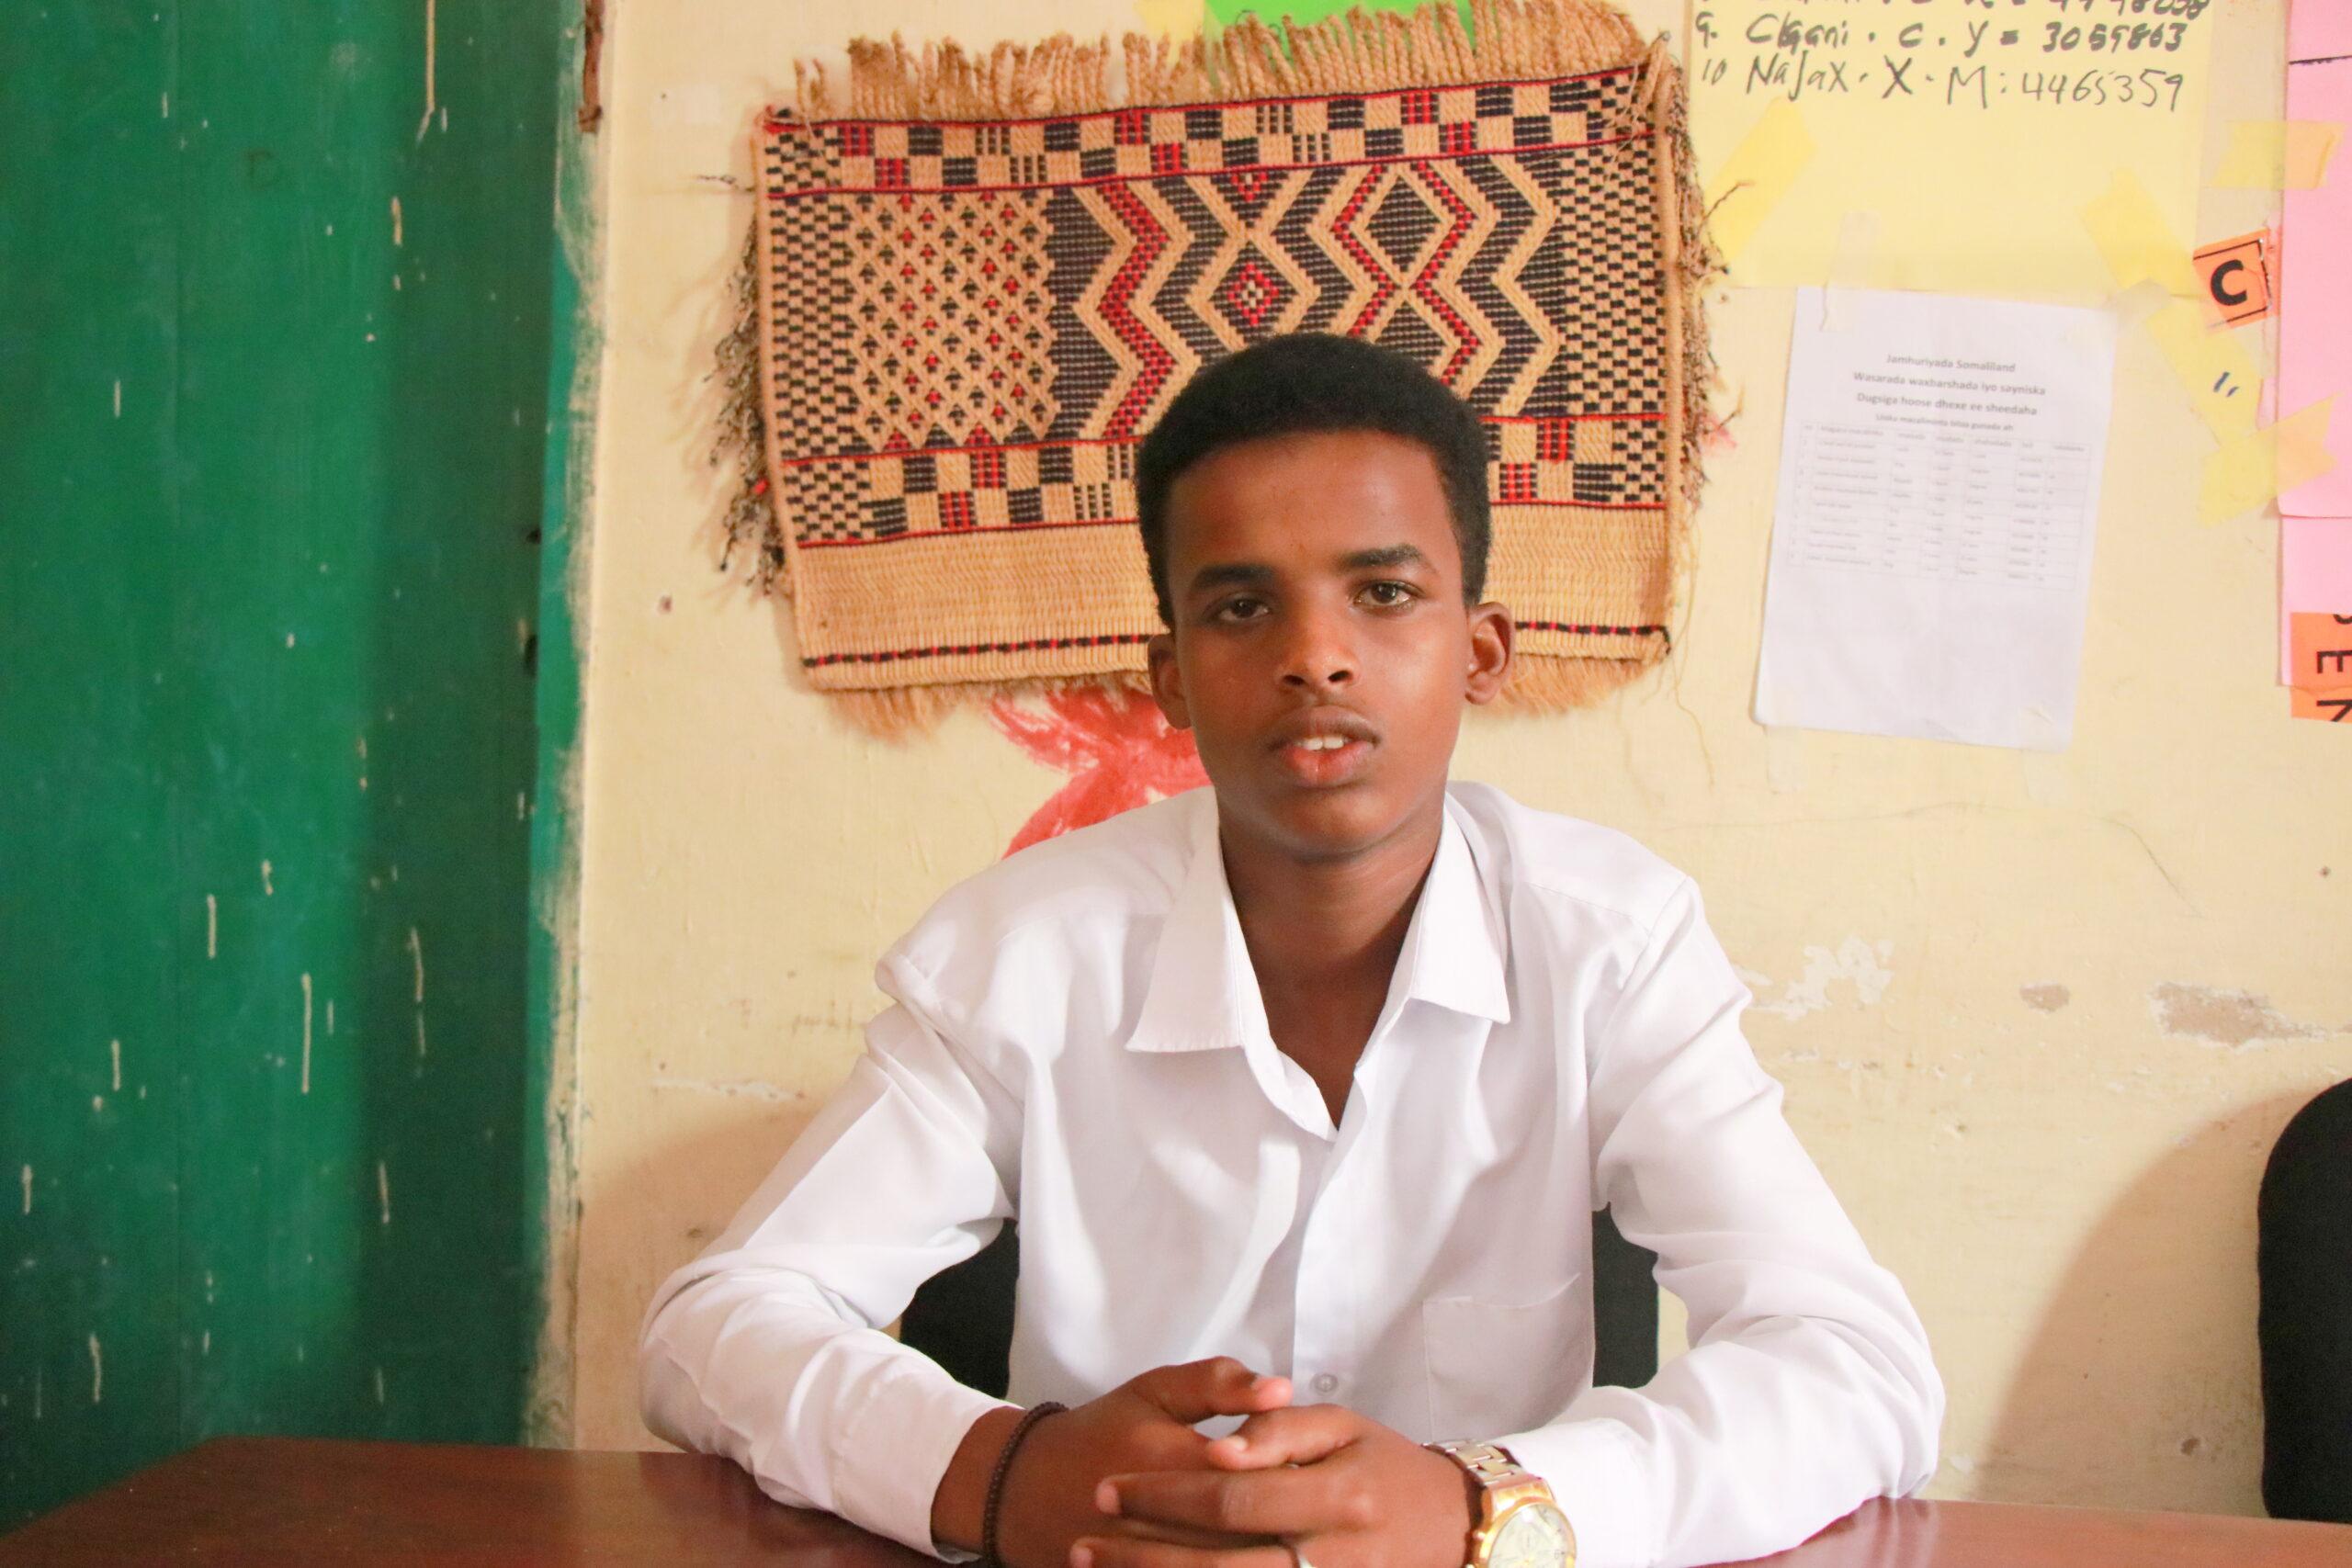 Hamse Abdilahi Abdirahman is one of the students in Sheedaha intermediate school in Hargeisa